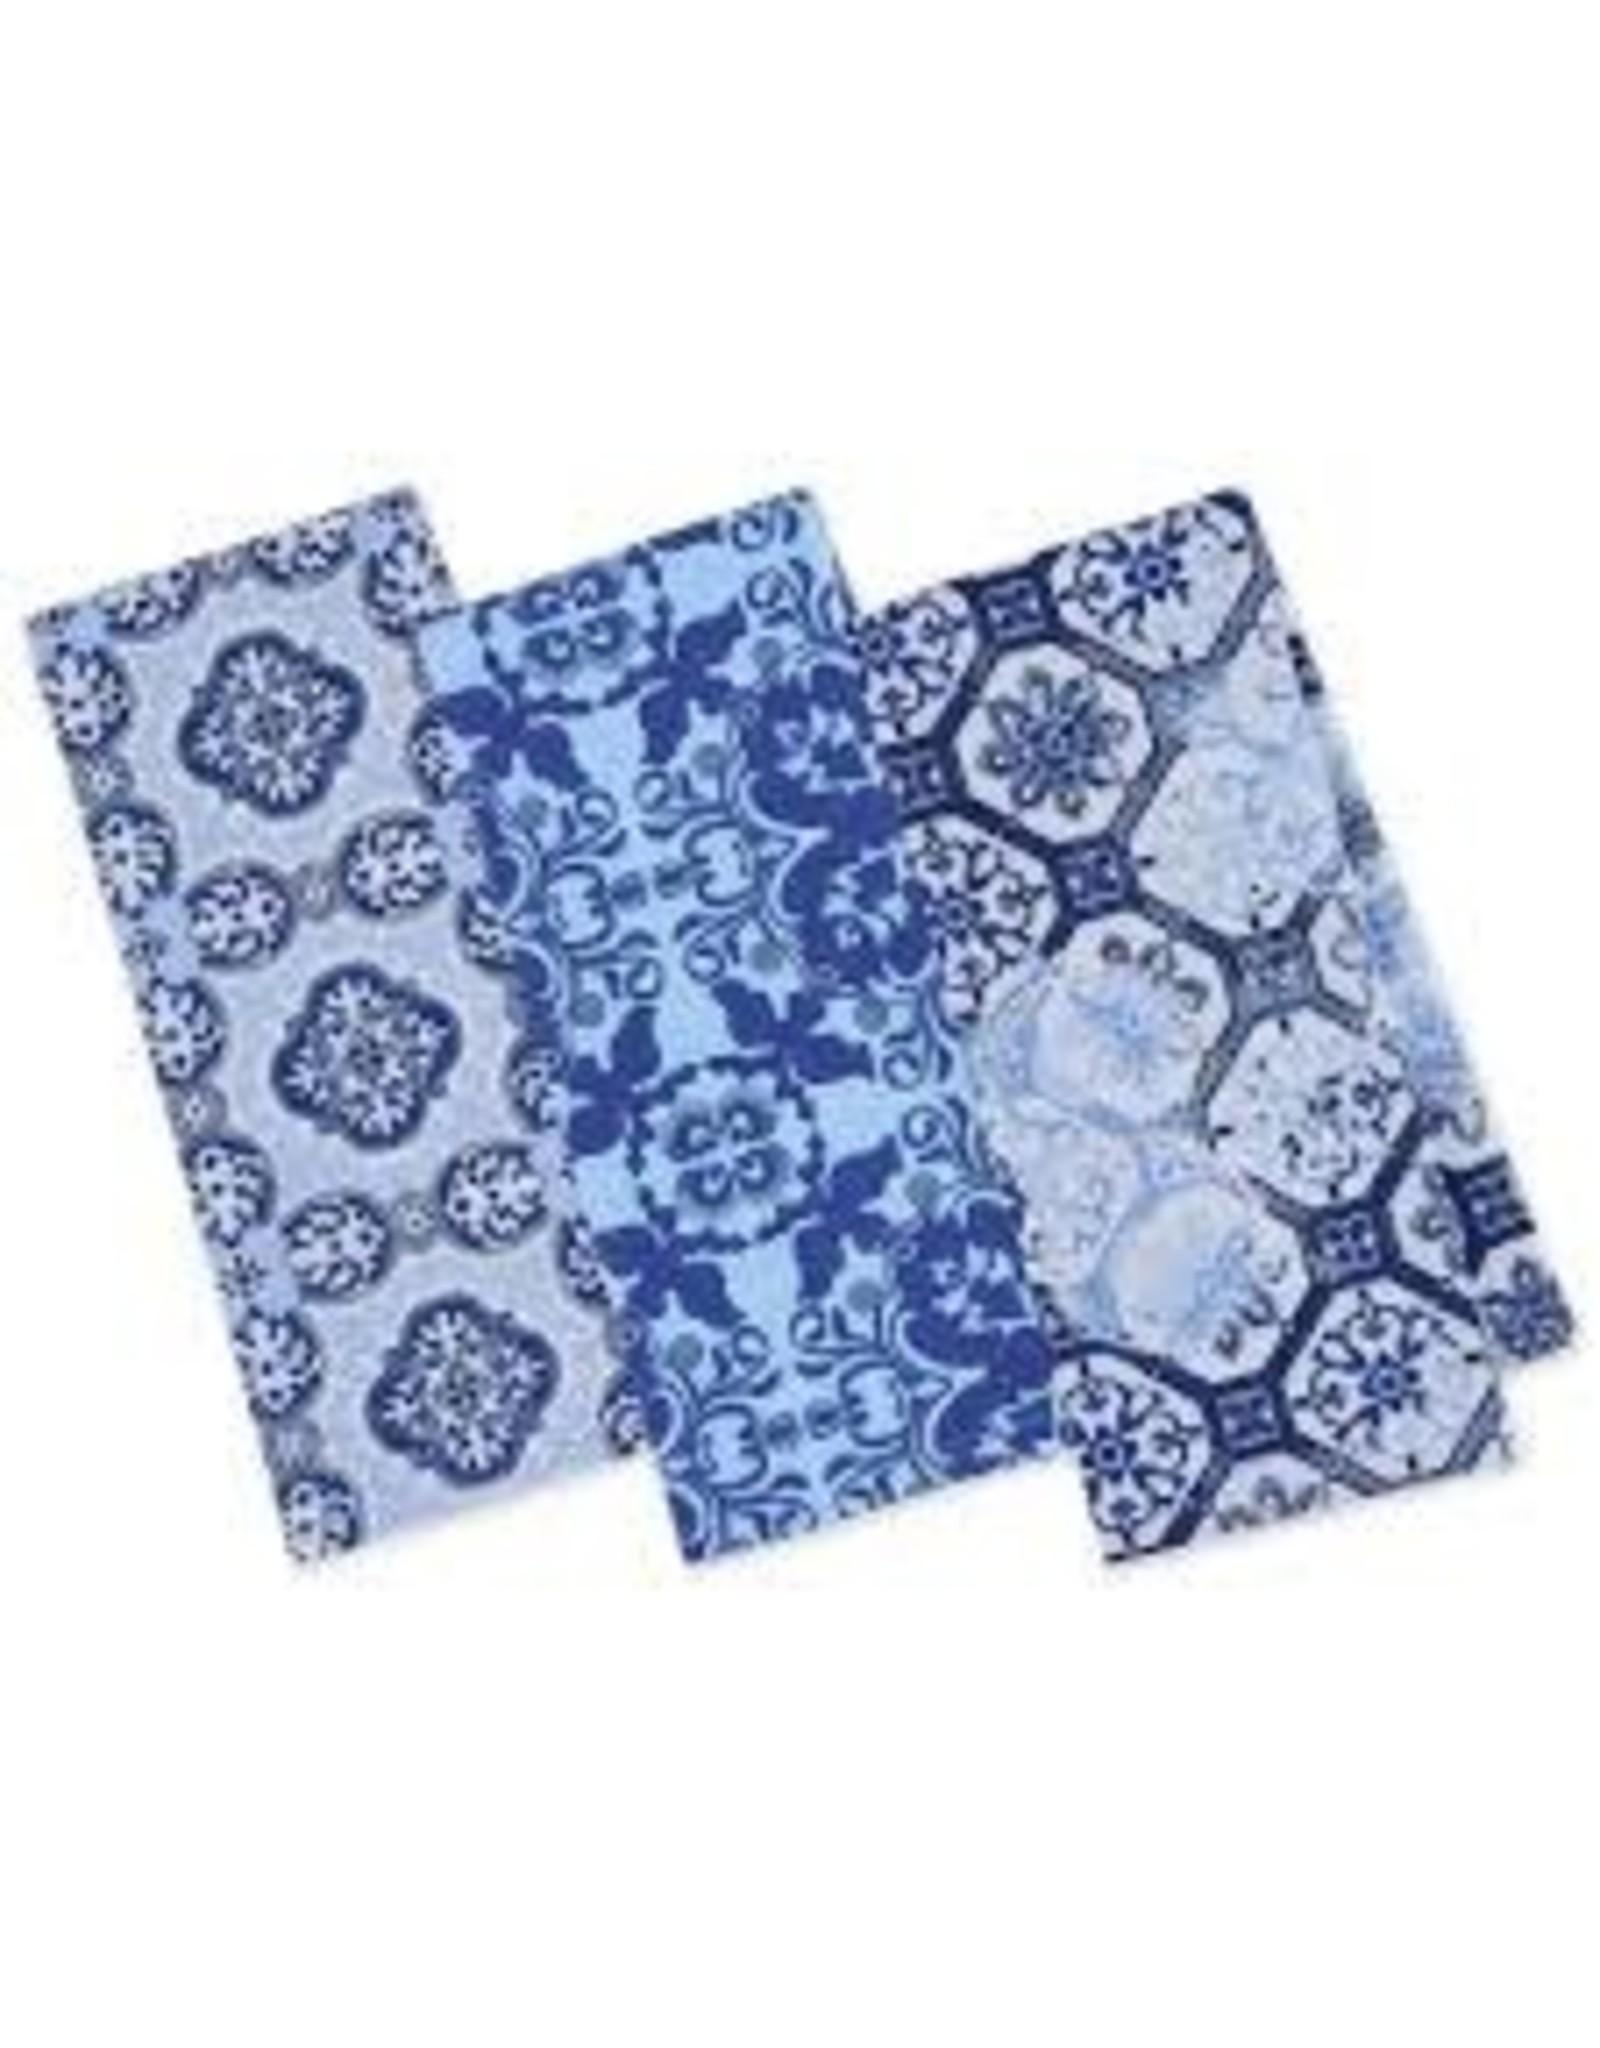 Design Imports DI Porto Blue Printed Dishtowels Mixed Dozen